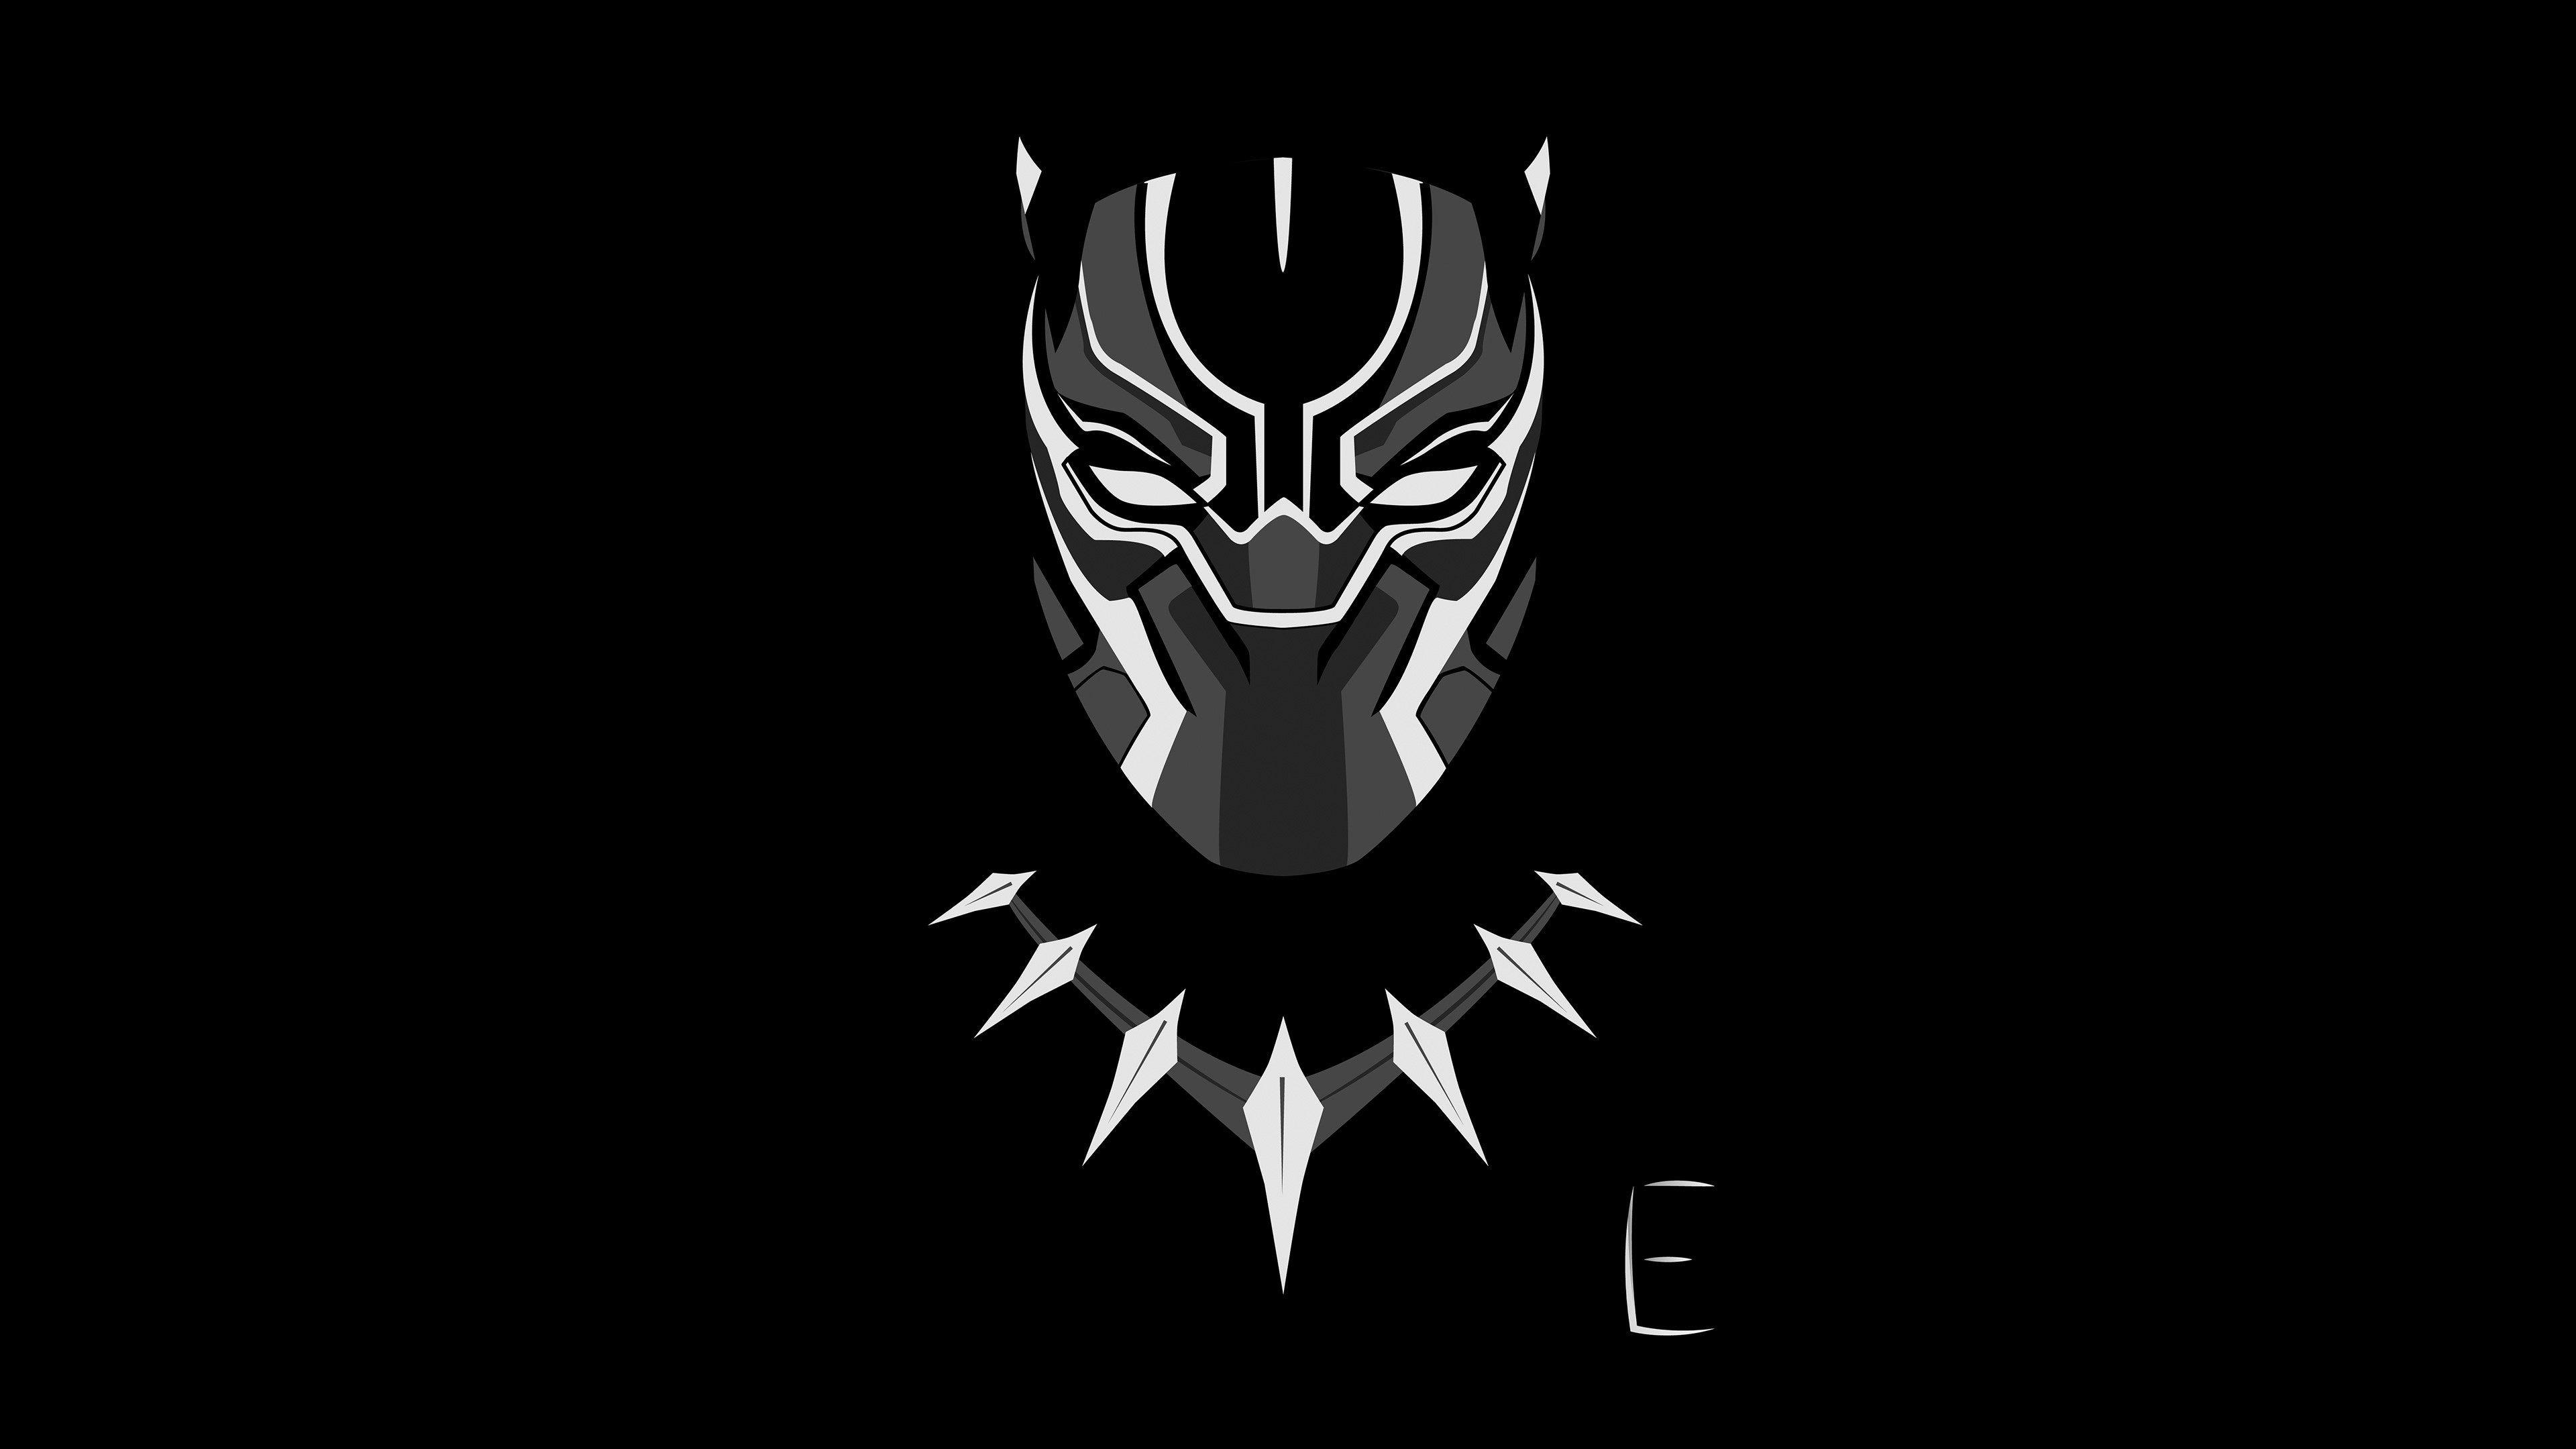 3840x2160 black panther 4k pc hd wallpaper download Marvel 3840x2160